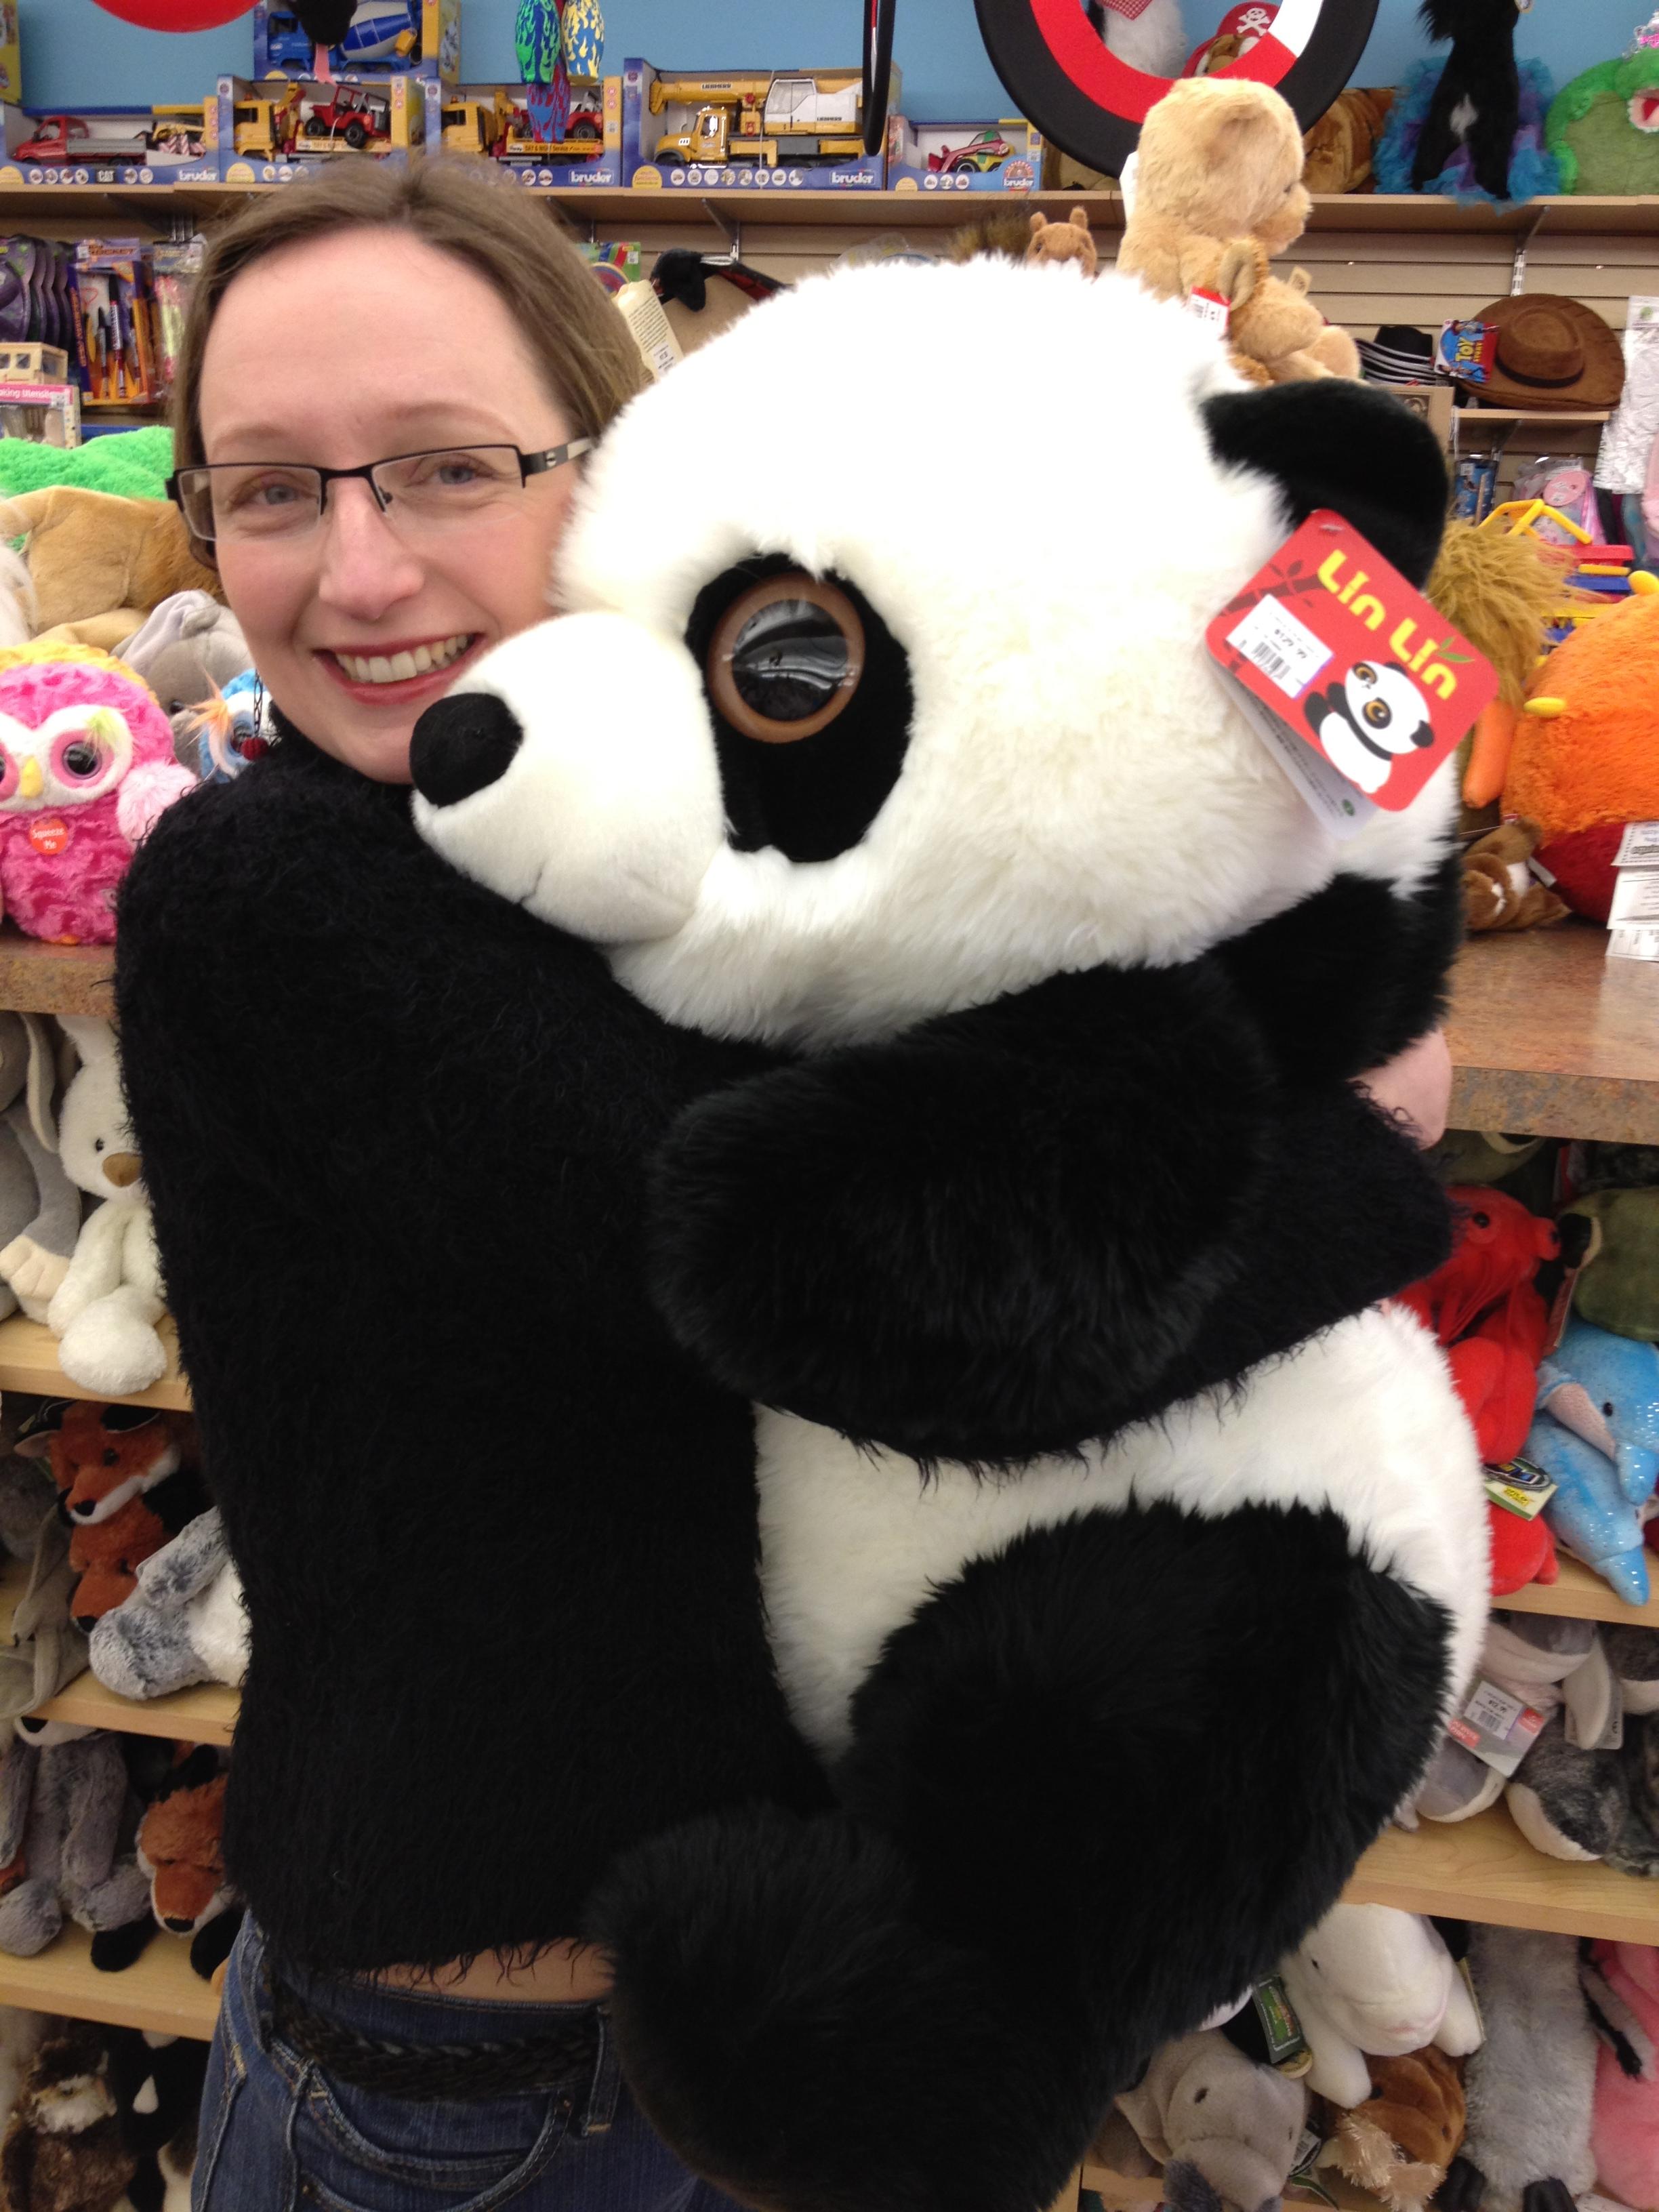 Portland_Toys_Giant_Plush_Panda